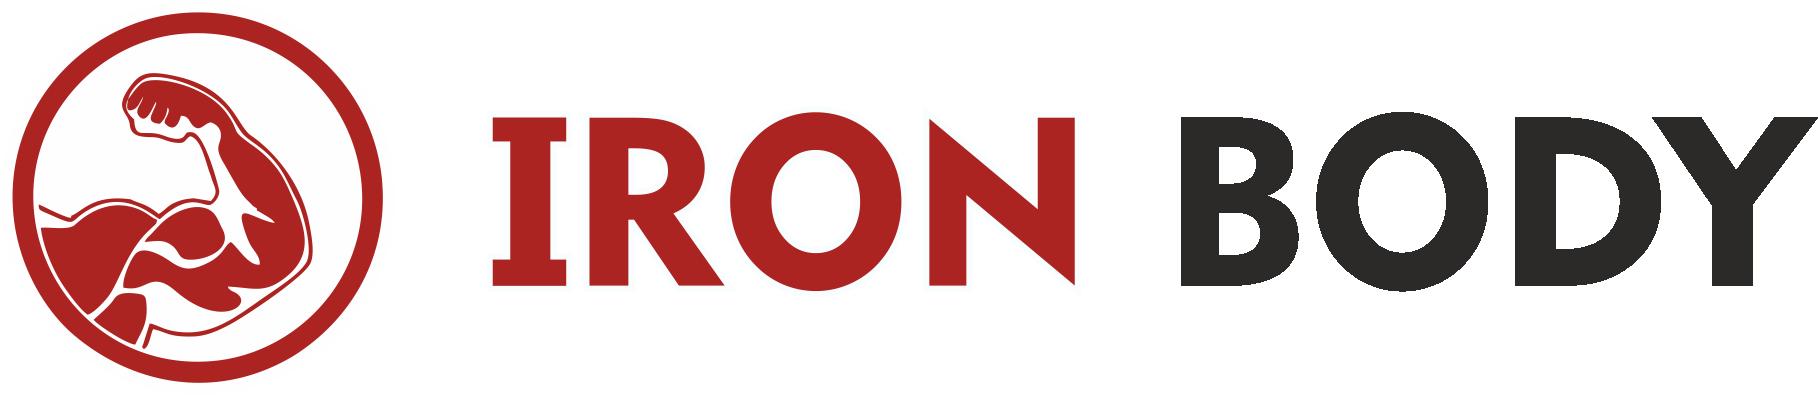 IronBody